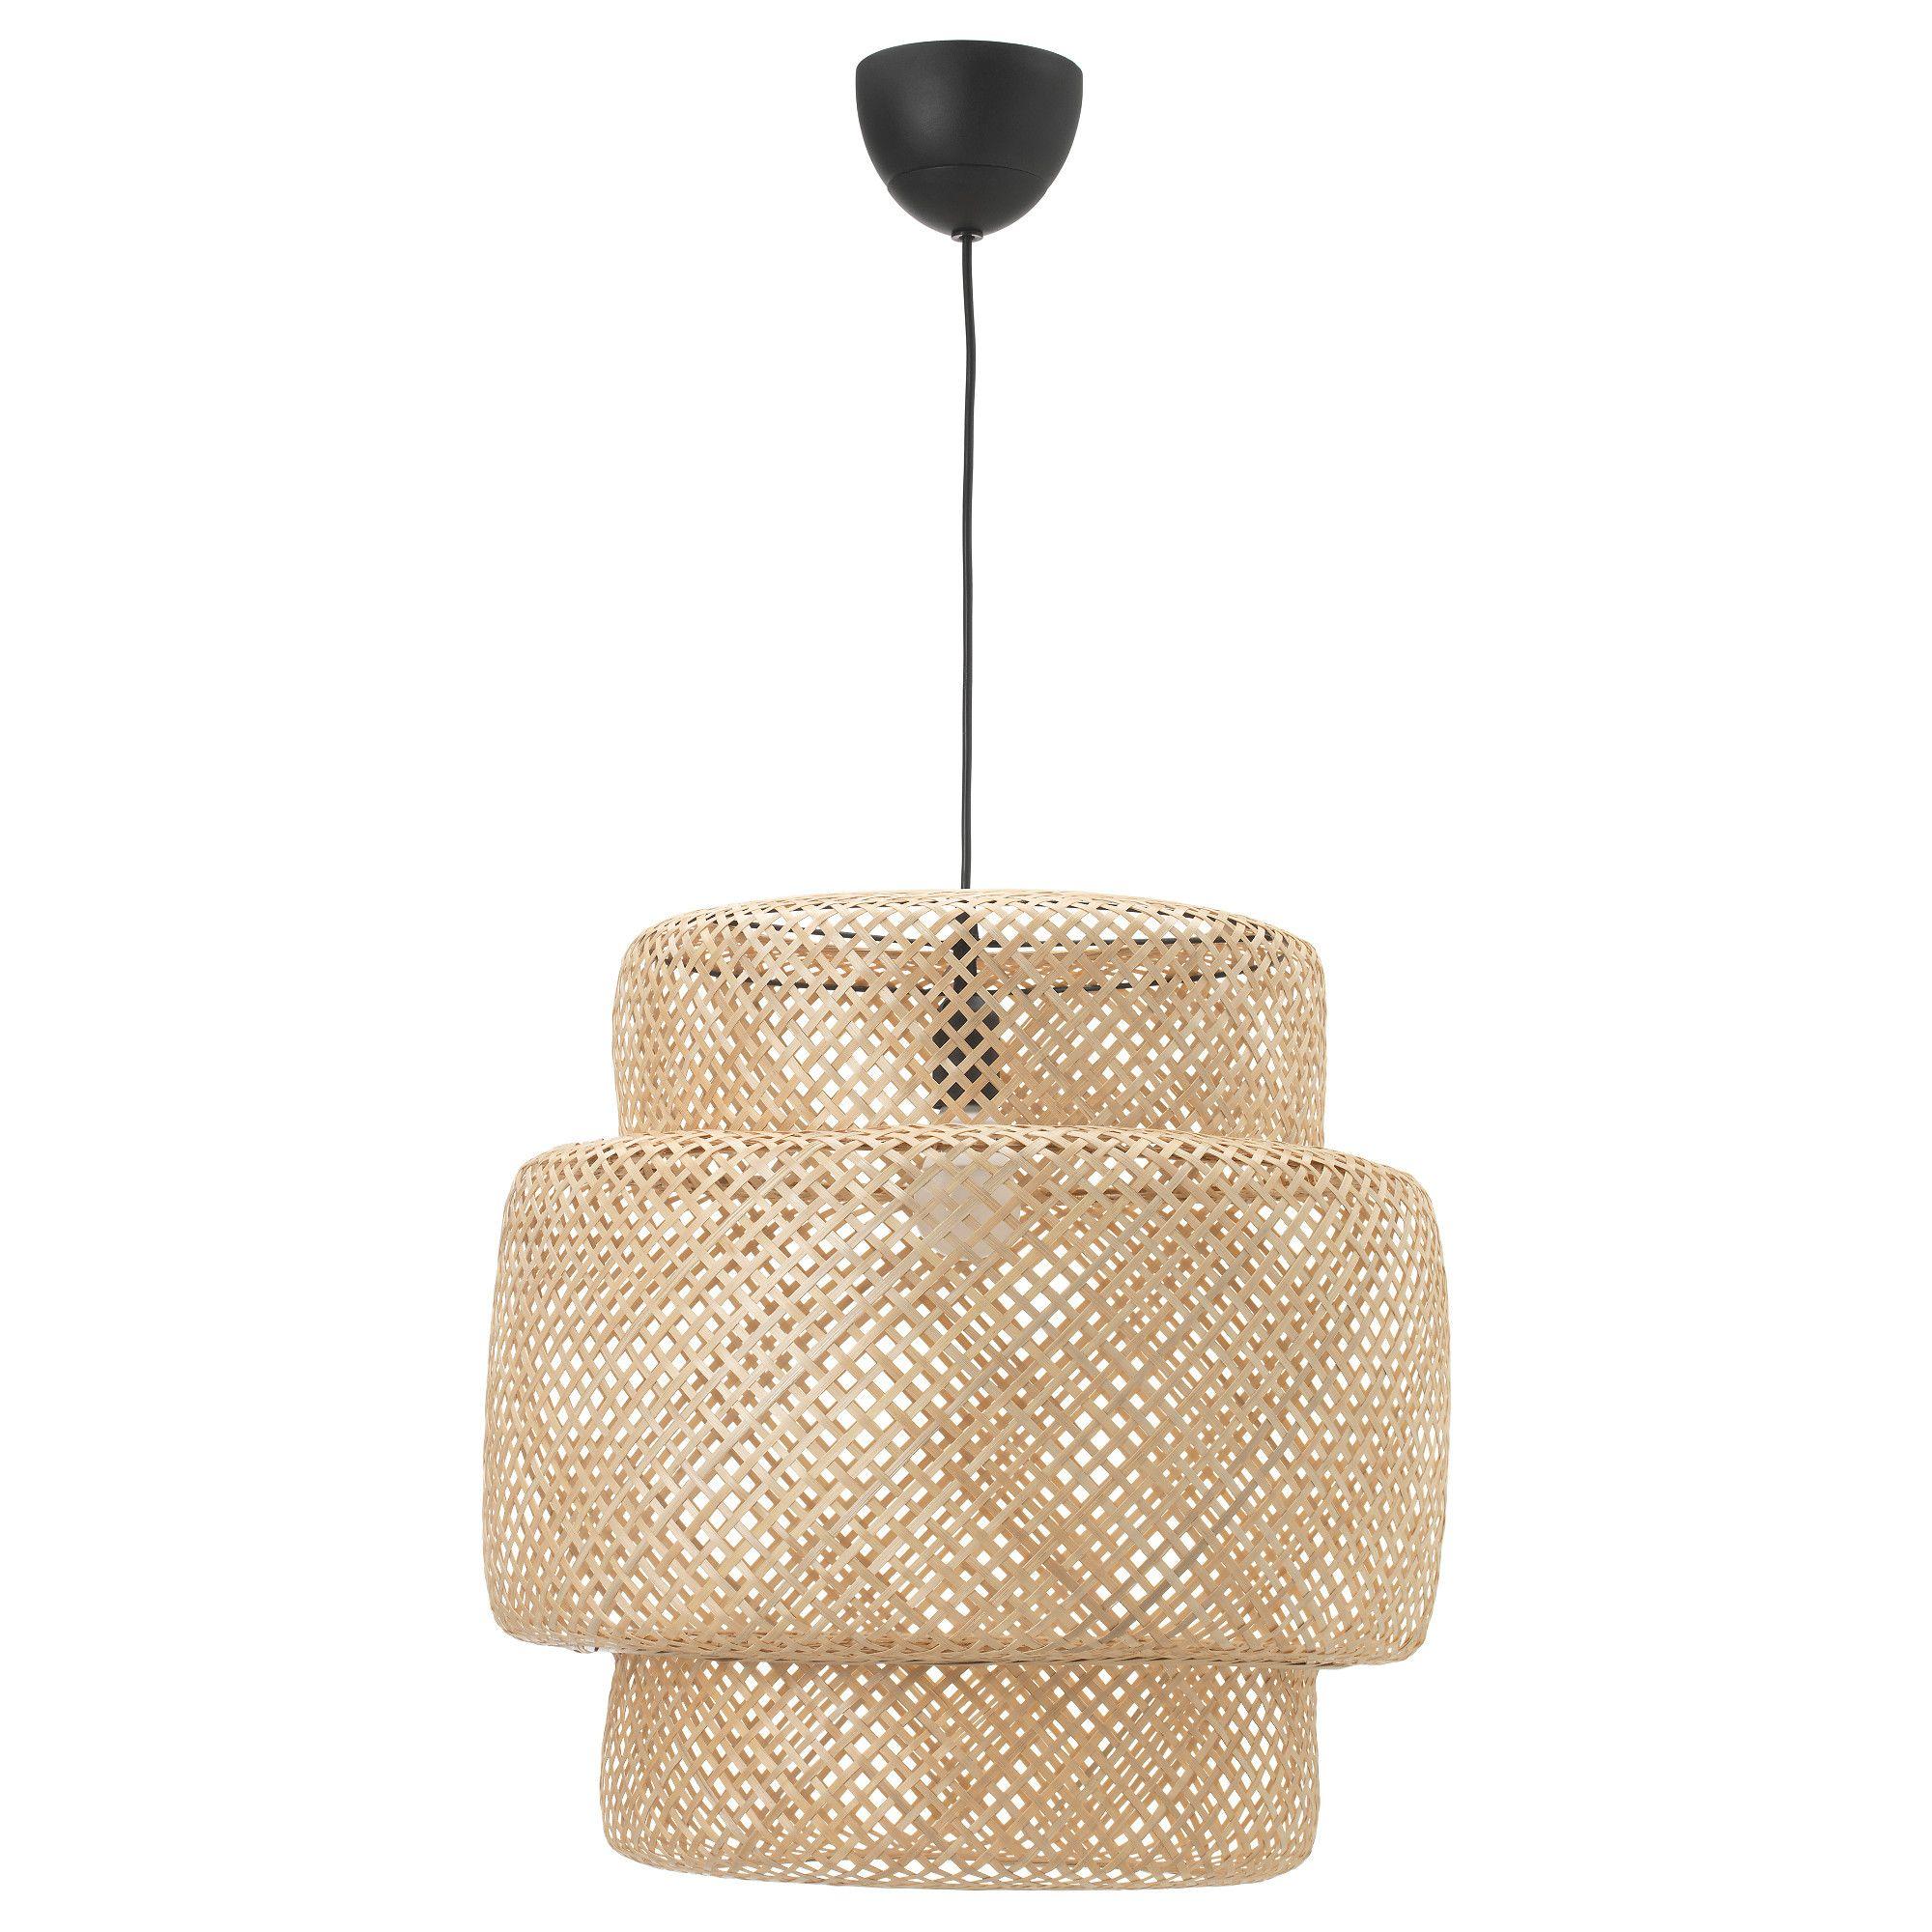 b9fac59779a6e097ace624ec6925a419 Schöne Lampe Mit Mehreren Lampenschirmen Dekorationen